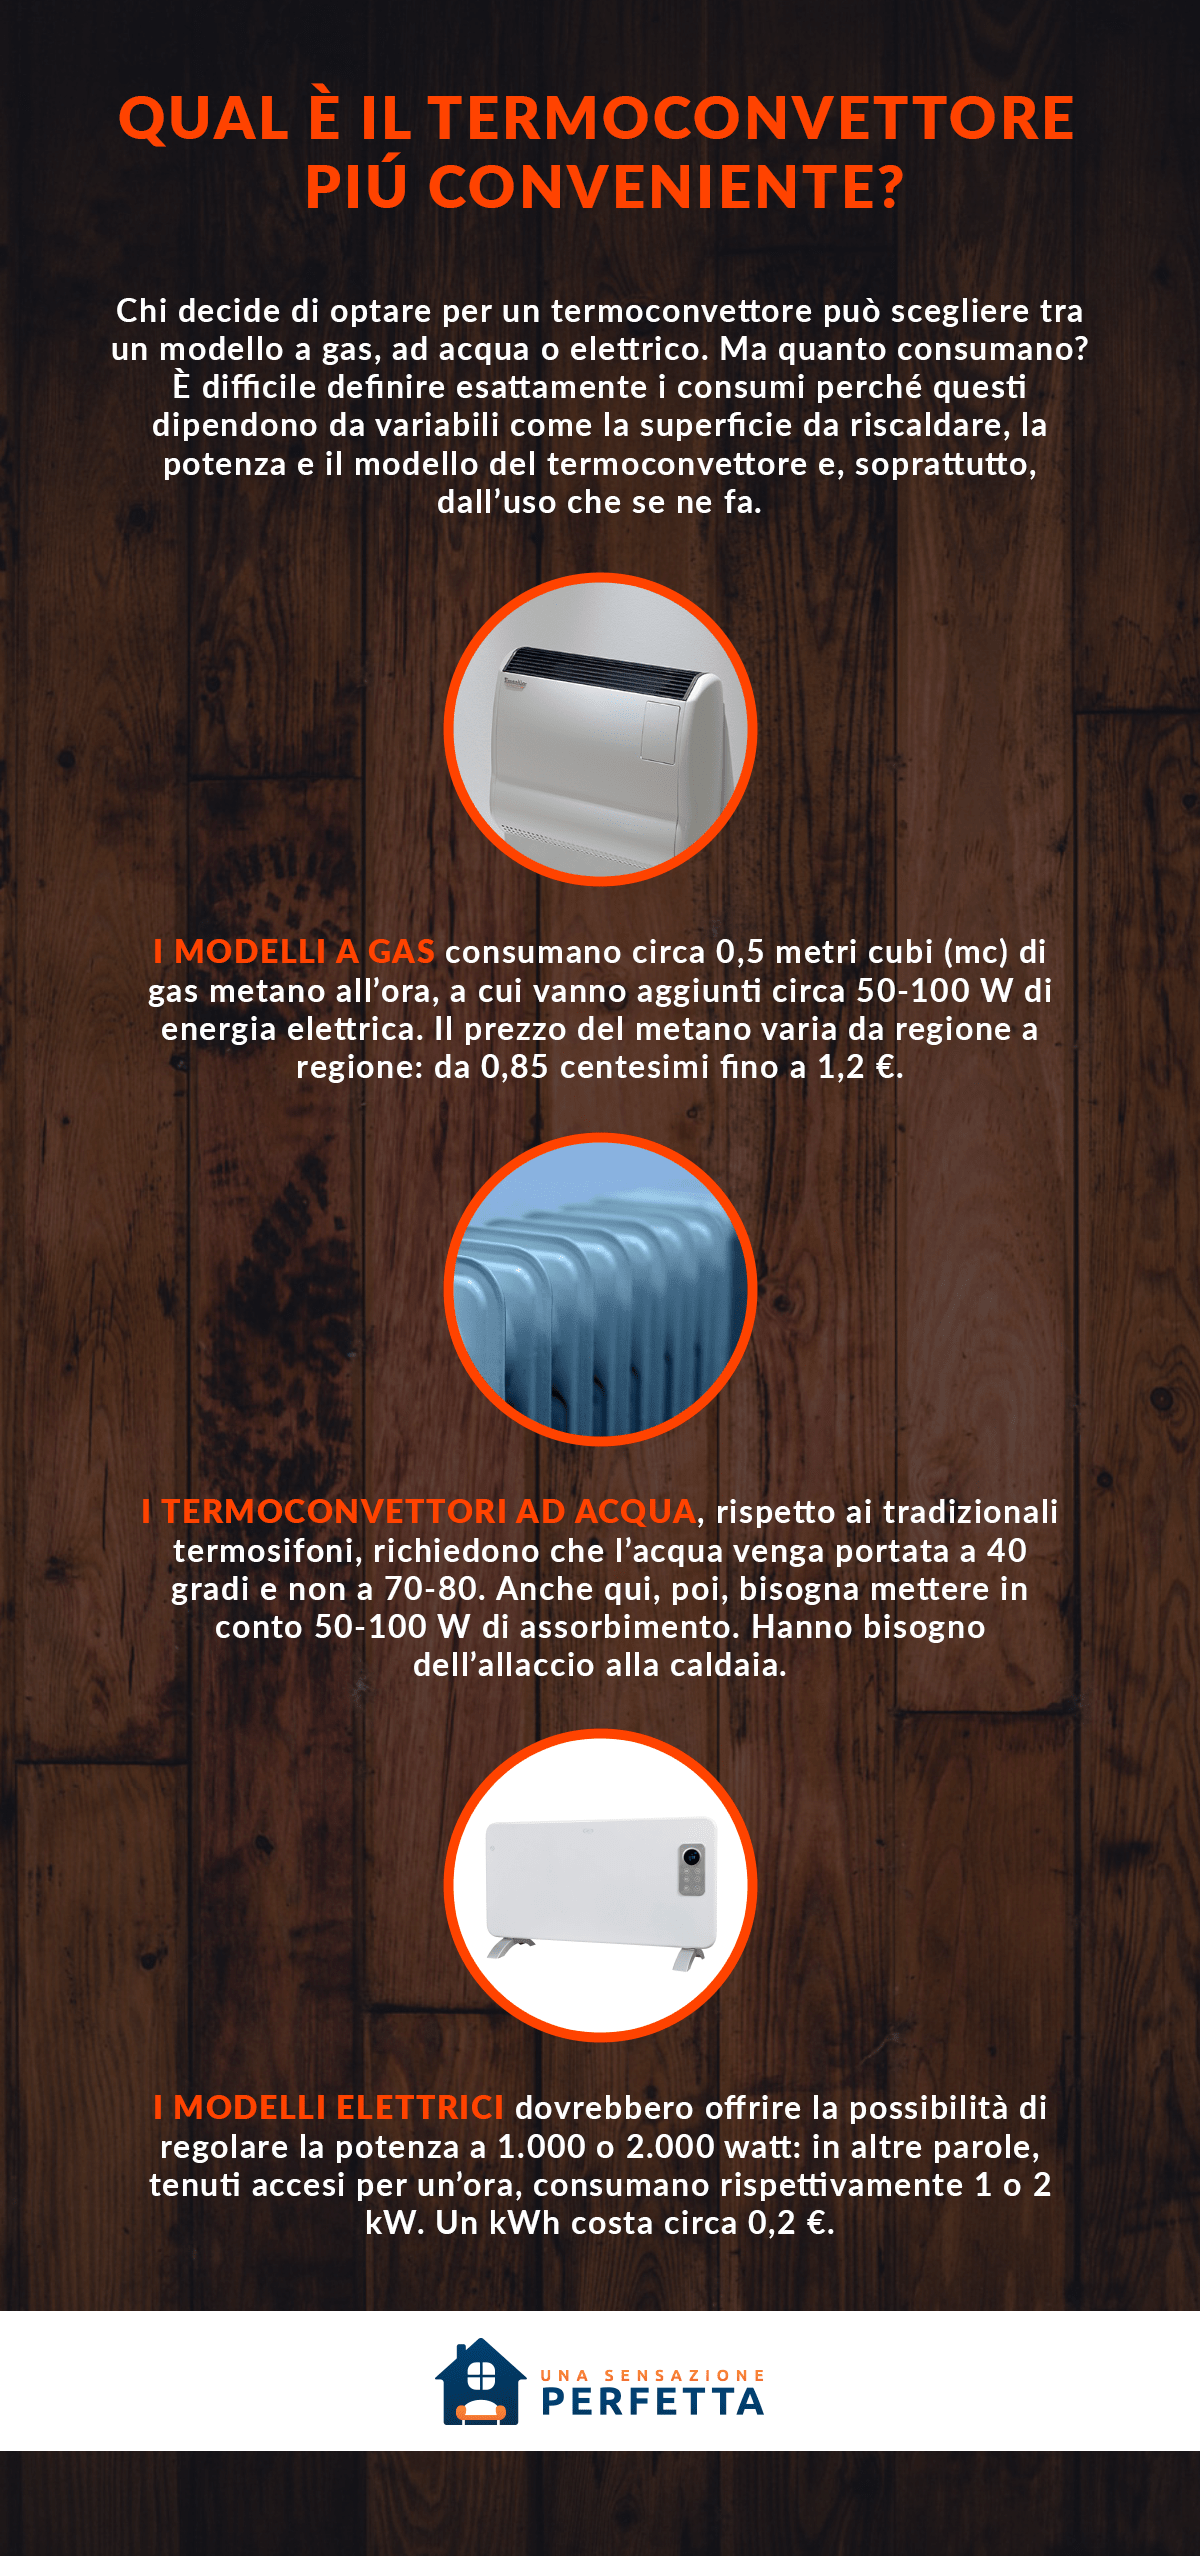 termoconvettore consumi, termoconvettore a gas, termoconvettore ad acqua, termoconvettore elettrico